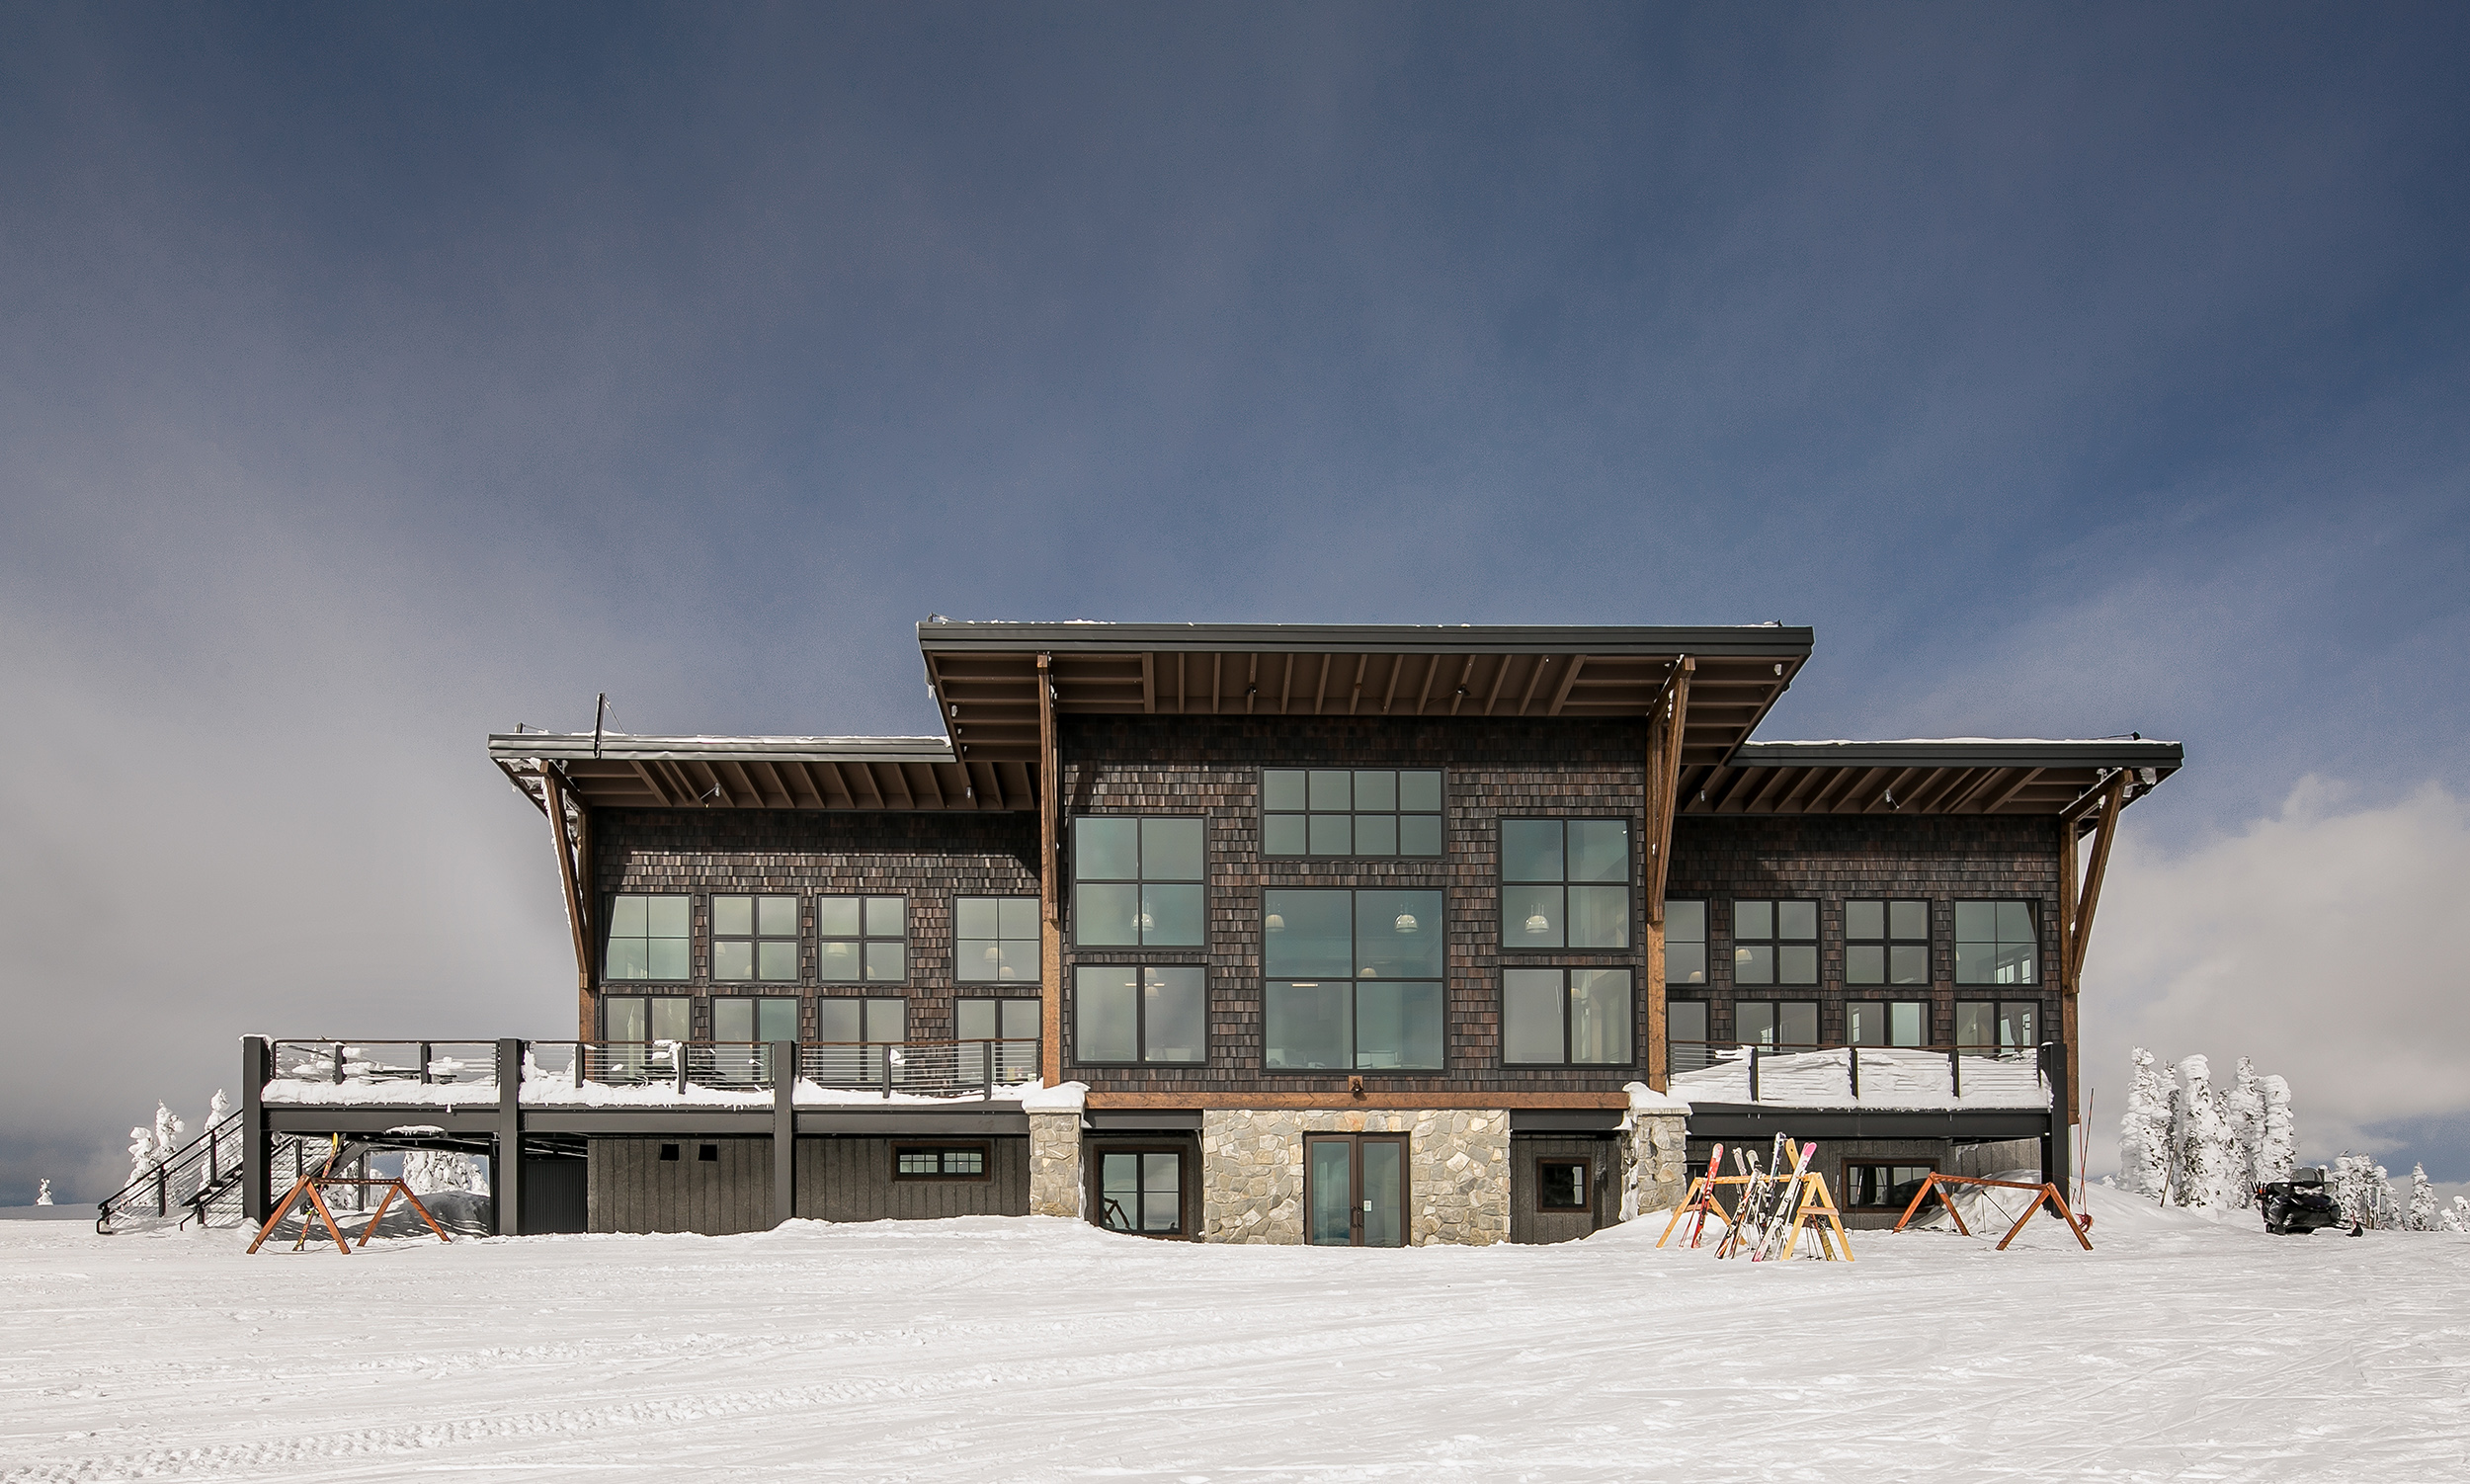 Skyhouse-Exterior-Sky-Schweitzer-Lodge-Skiing.jpg